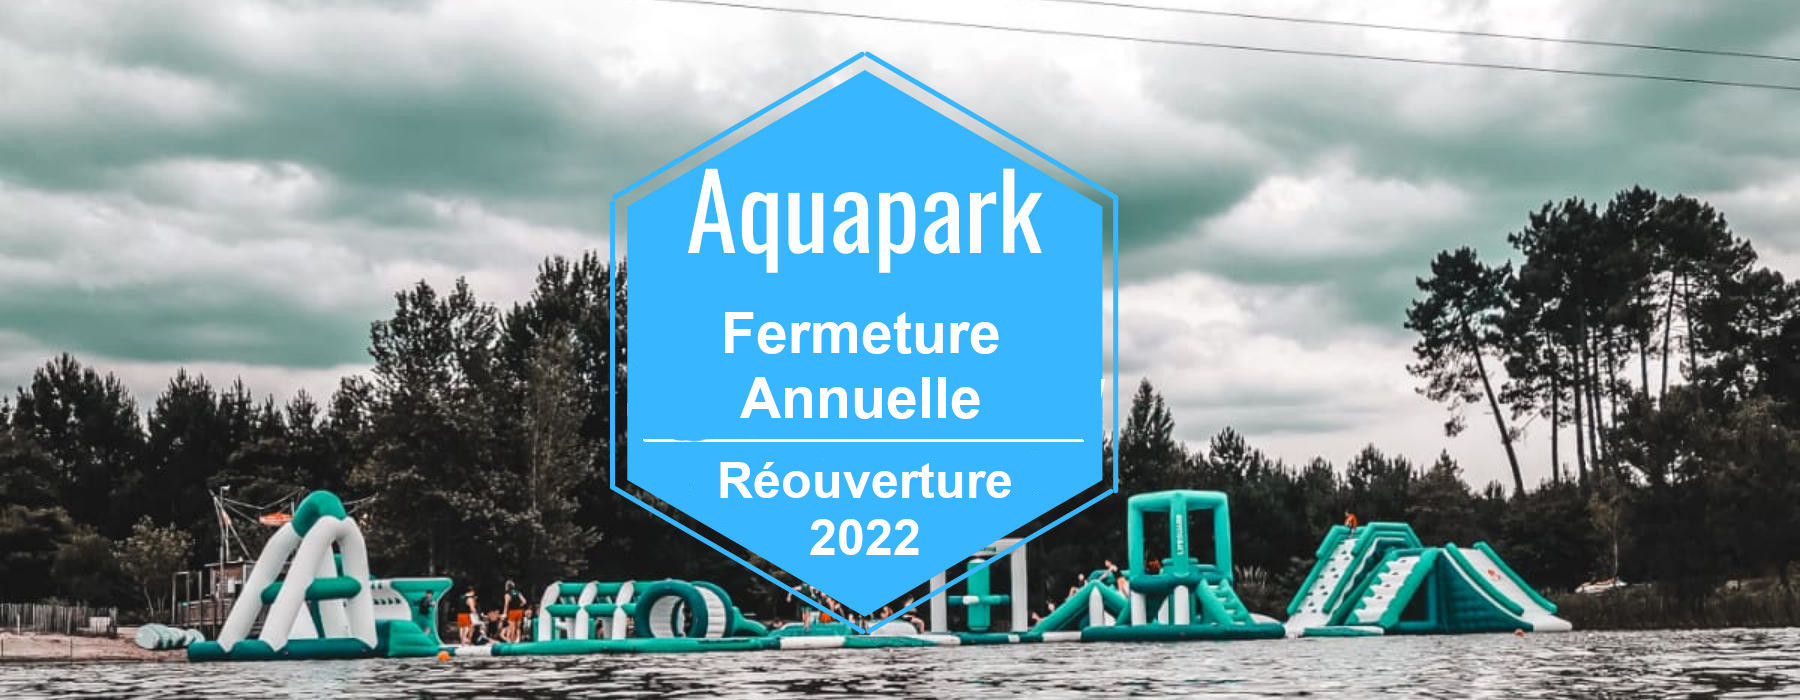 fermeture aquapark